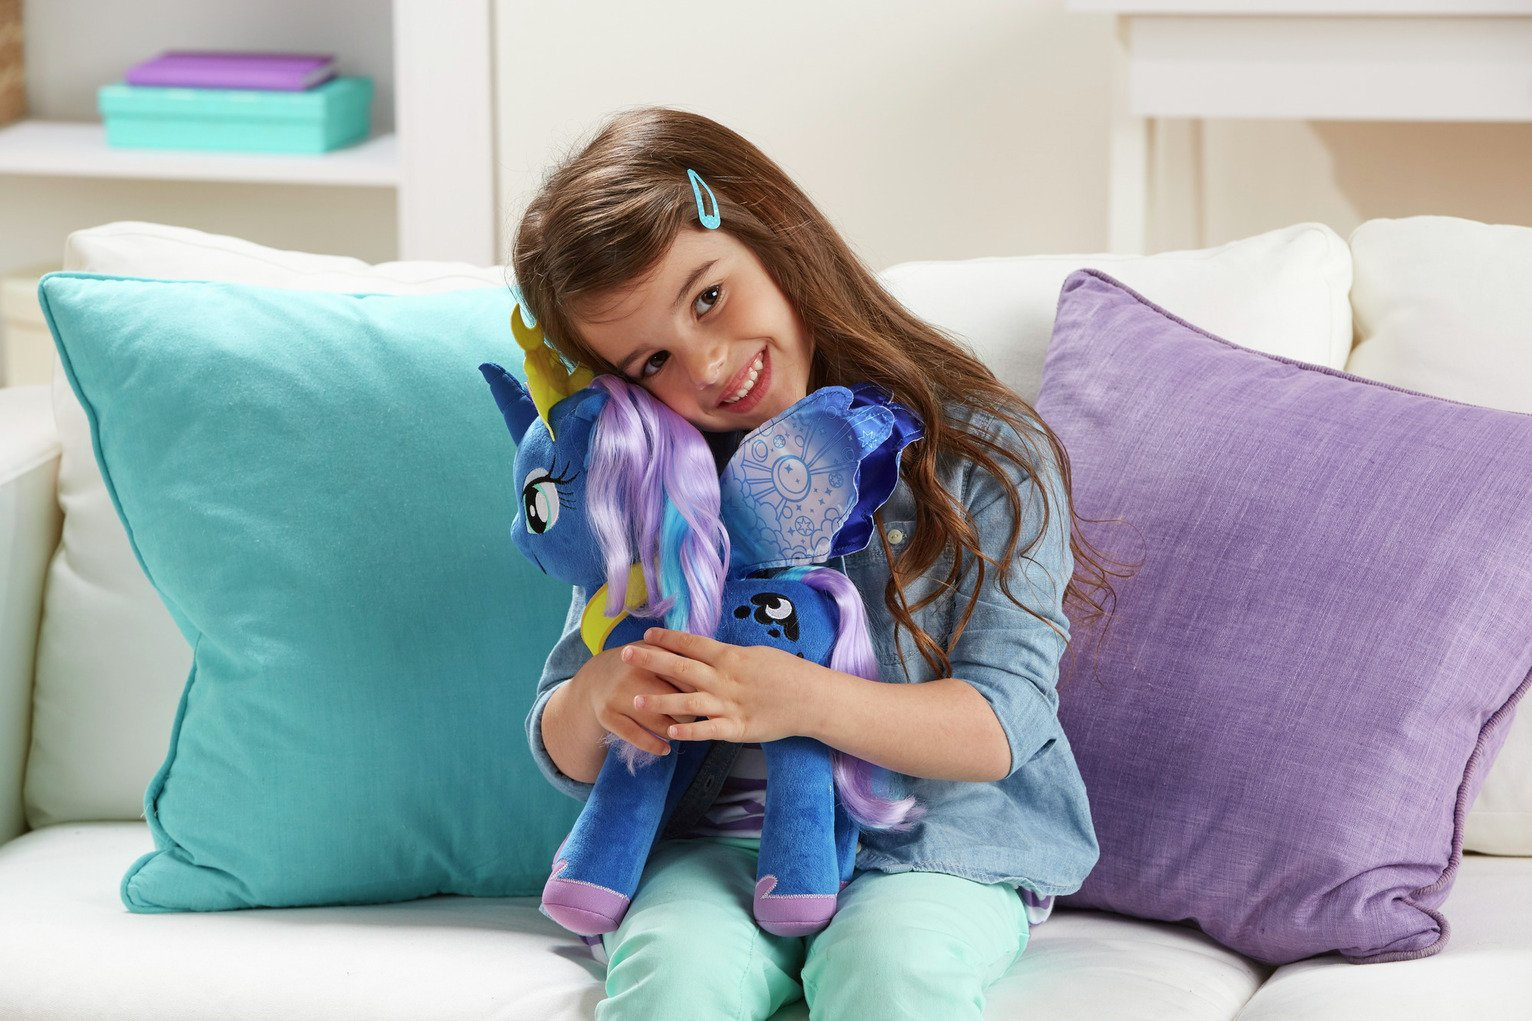 My Little Pony: The Movie Large Soft Plush Assortment